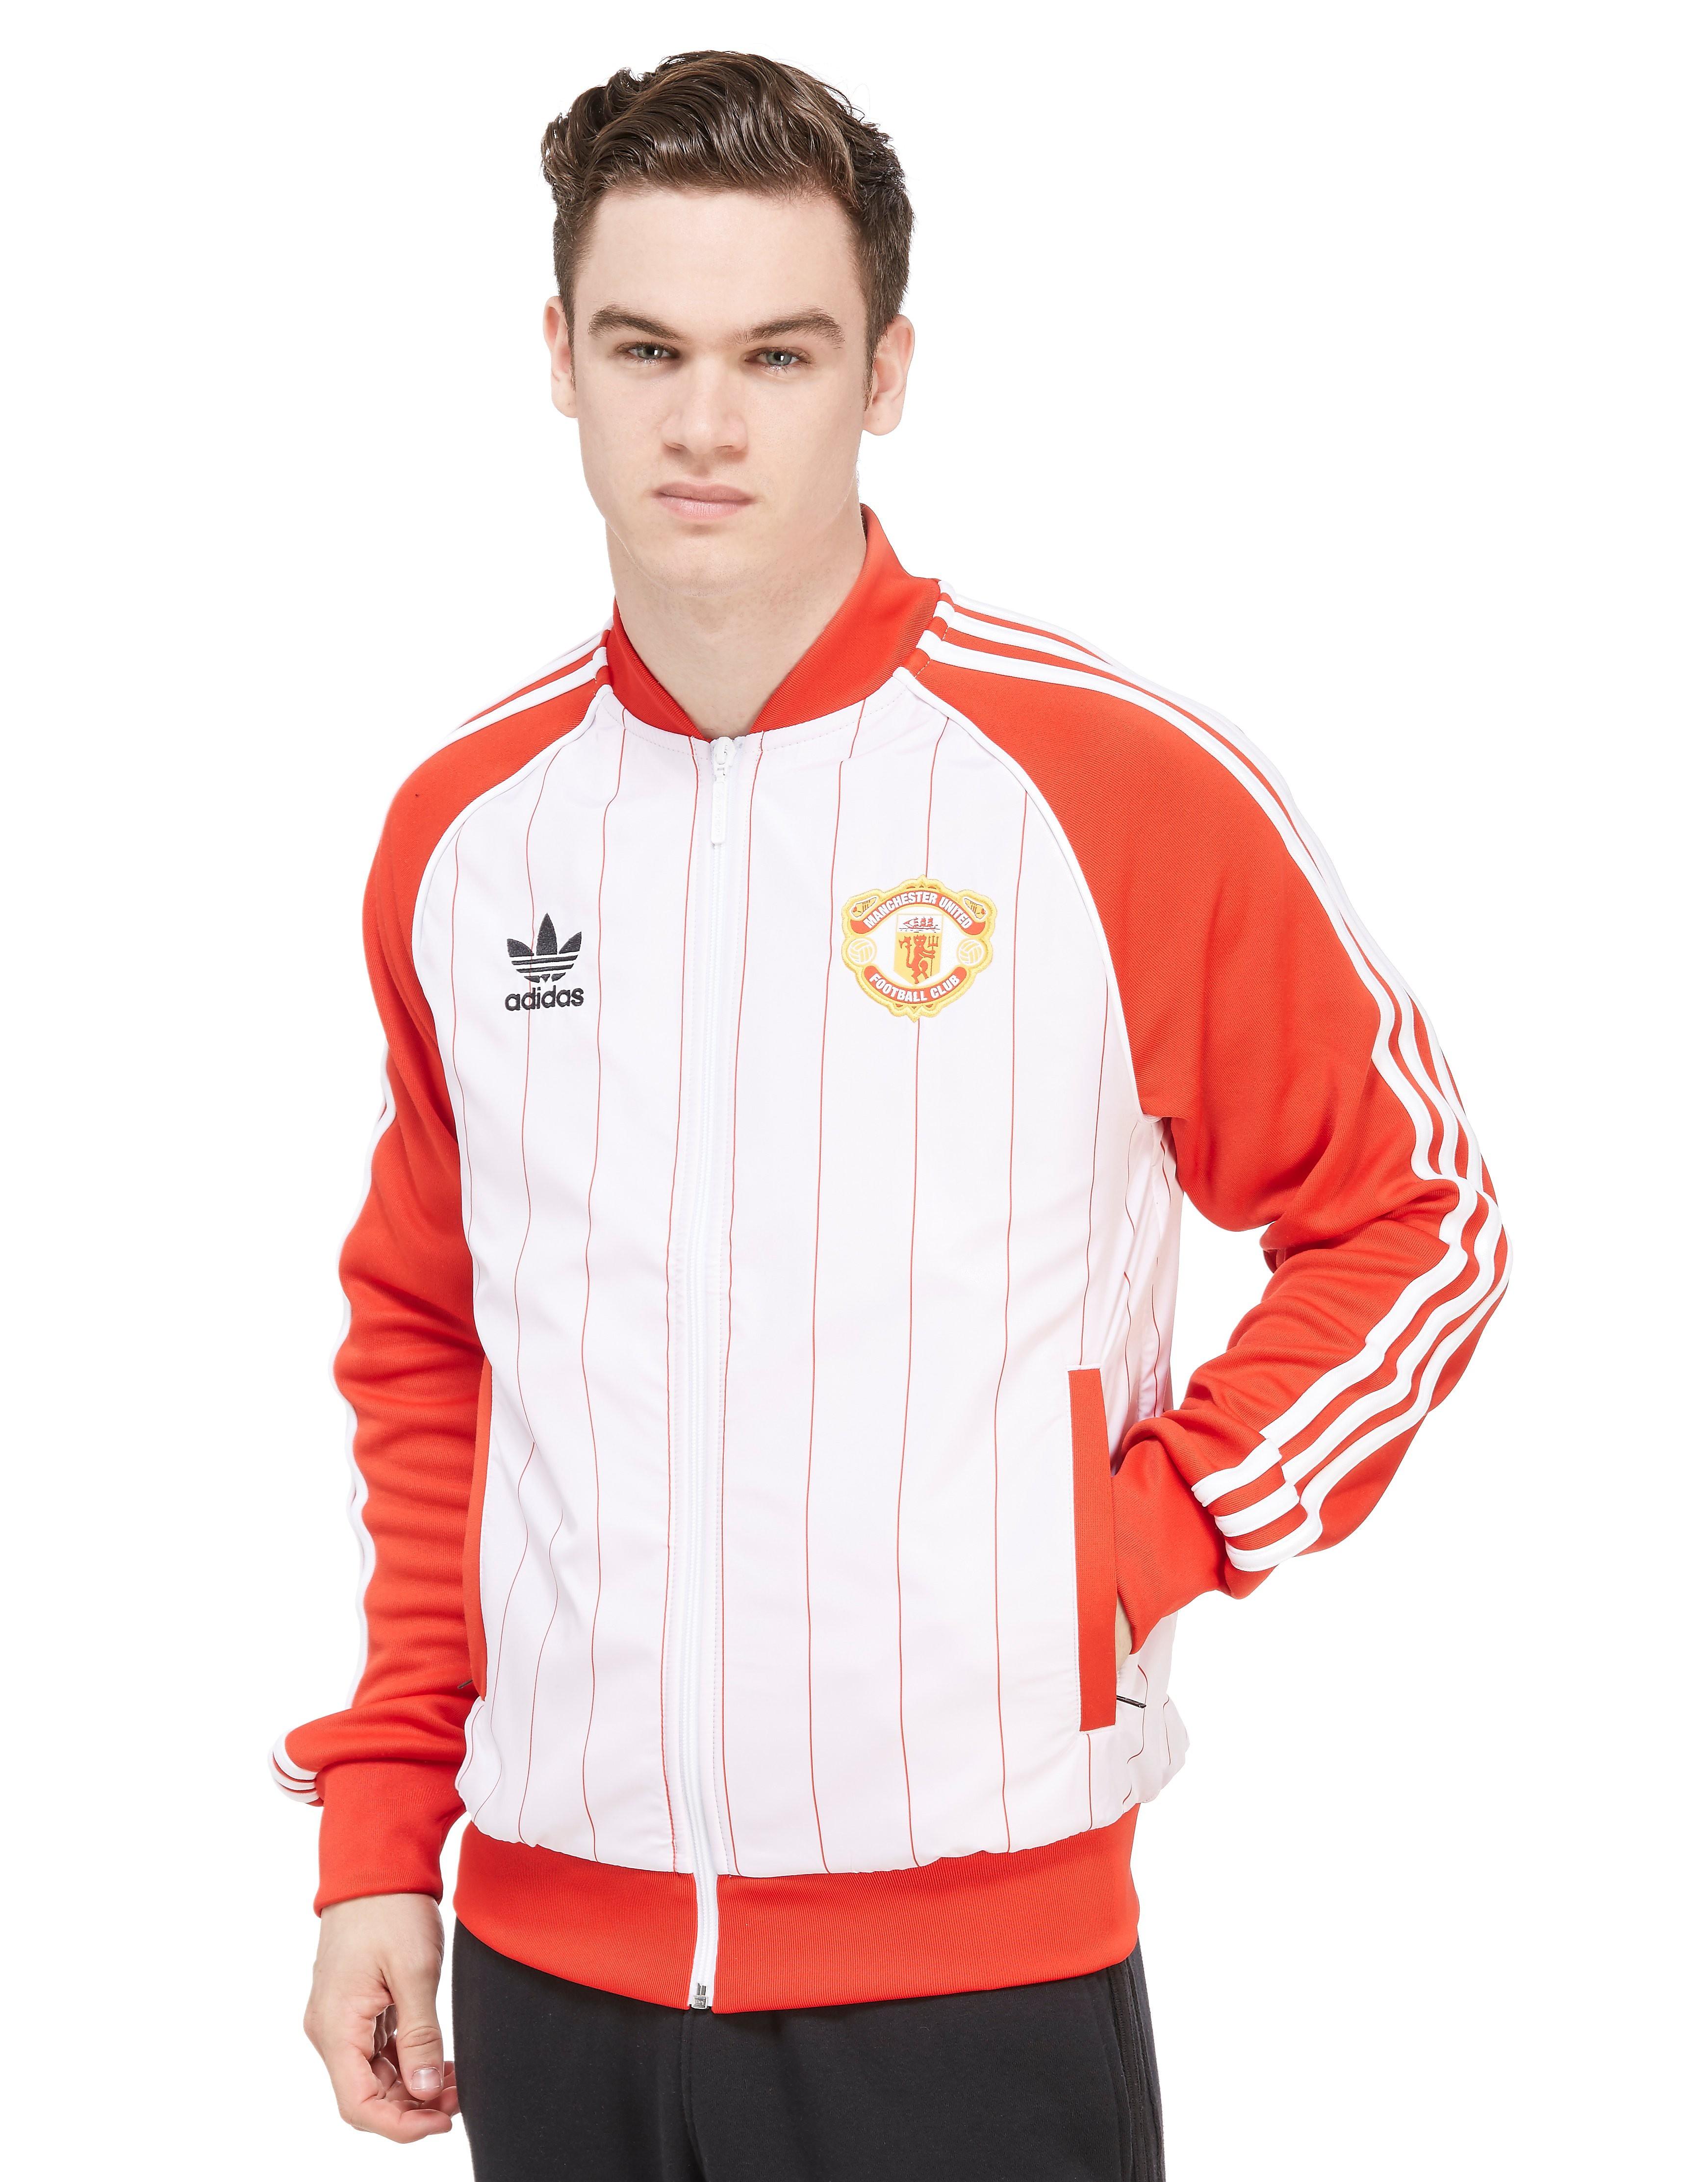 adidas Originals Manchester United FC Track Jacket